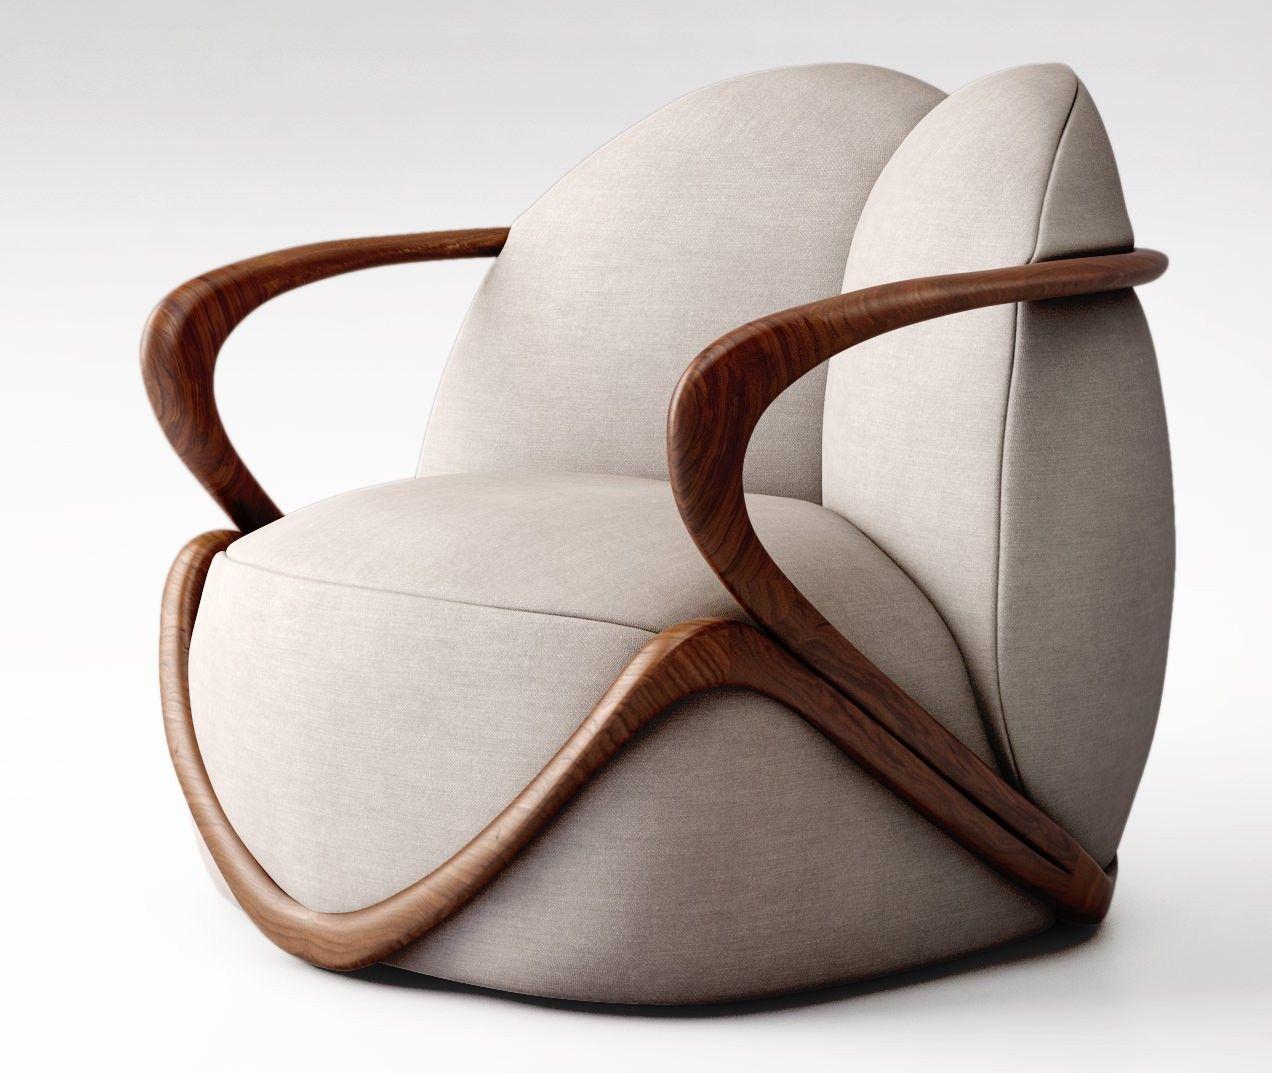 Image result for hug chairs Desain furnitur